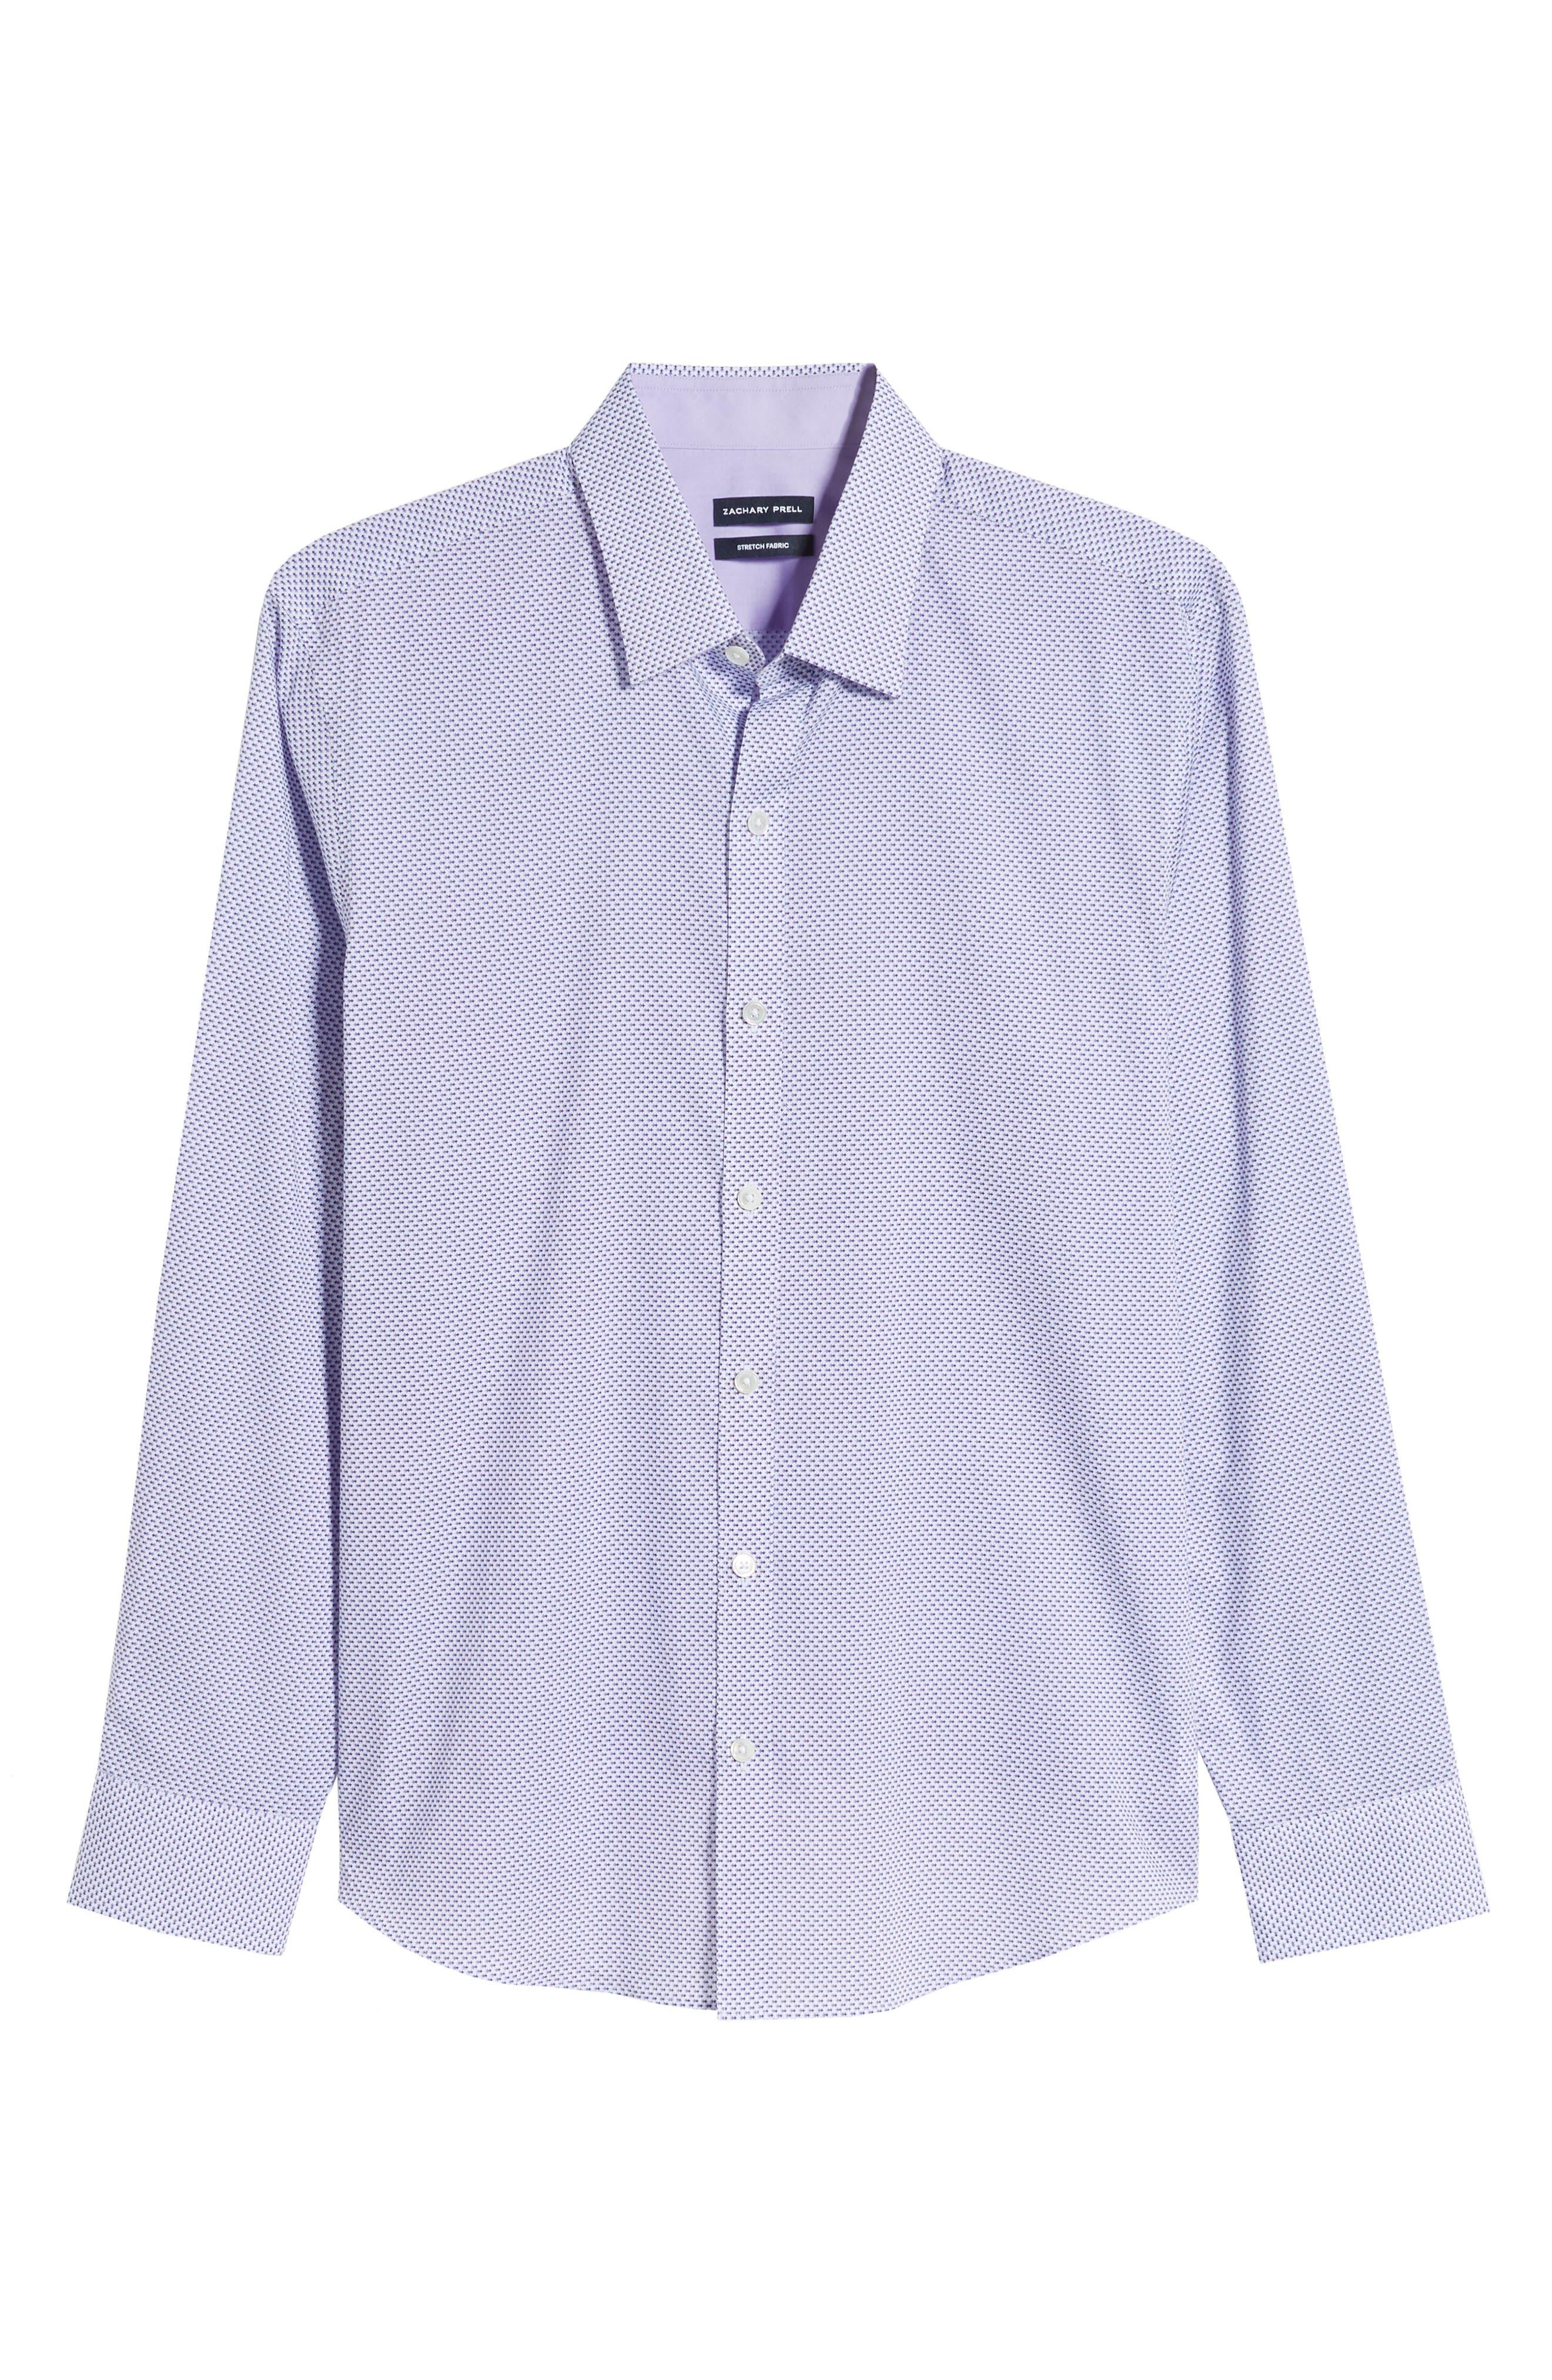 ZACHARY PRELL, Wilson Regular Fit Micro Print Sport Shirt, Alternate thumbnail 5, color, PURPLE